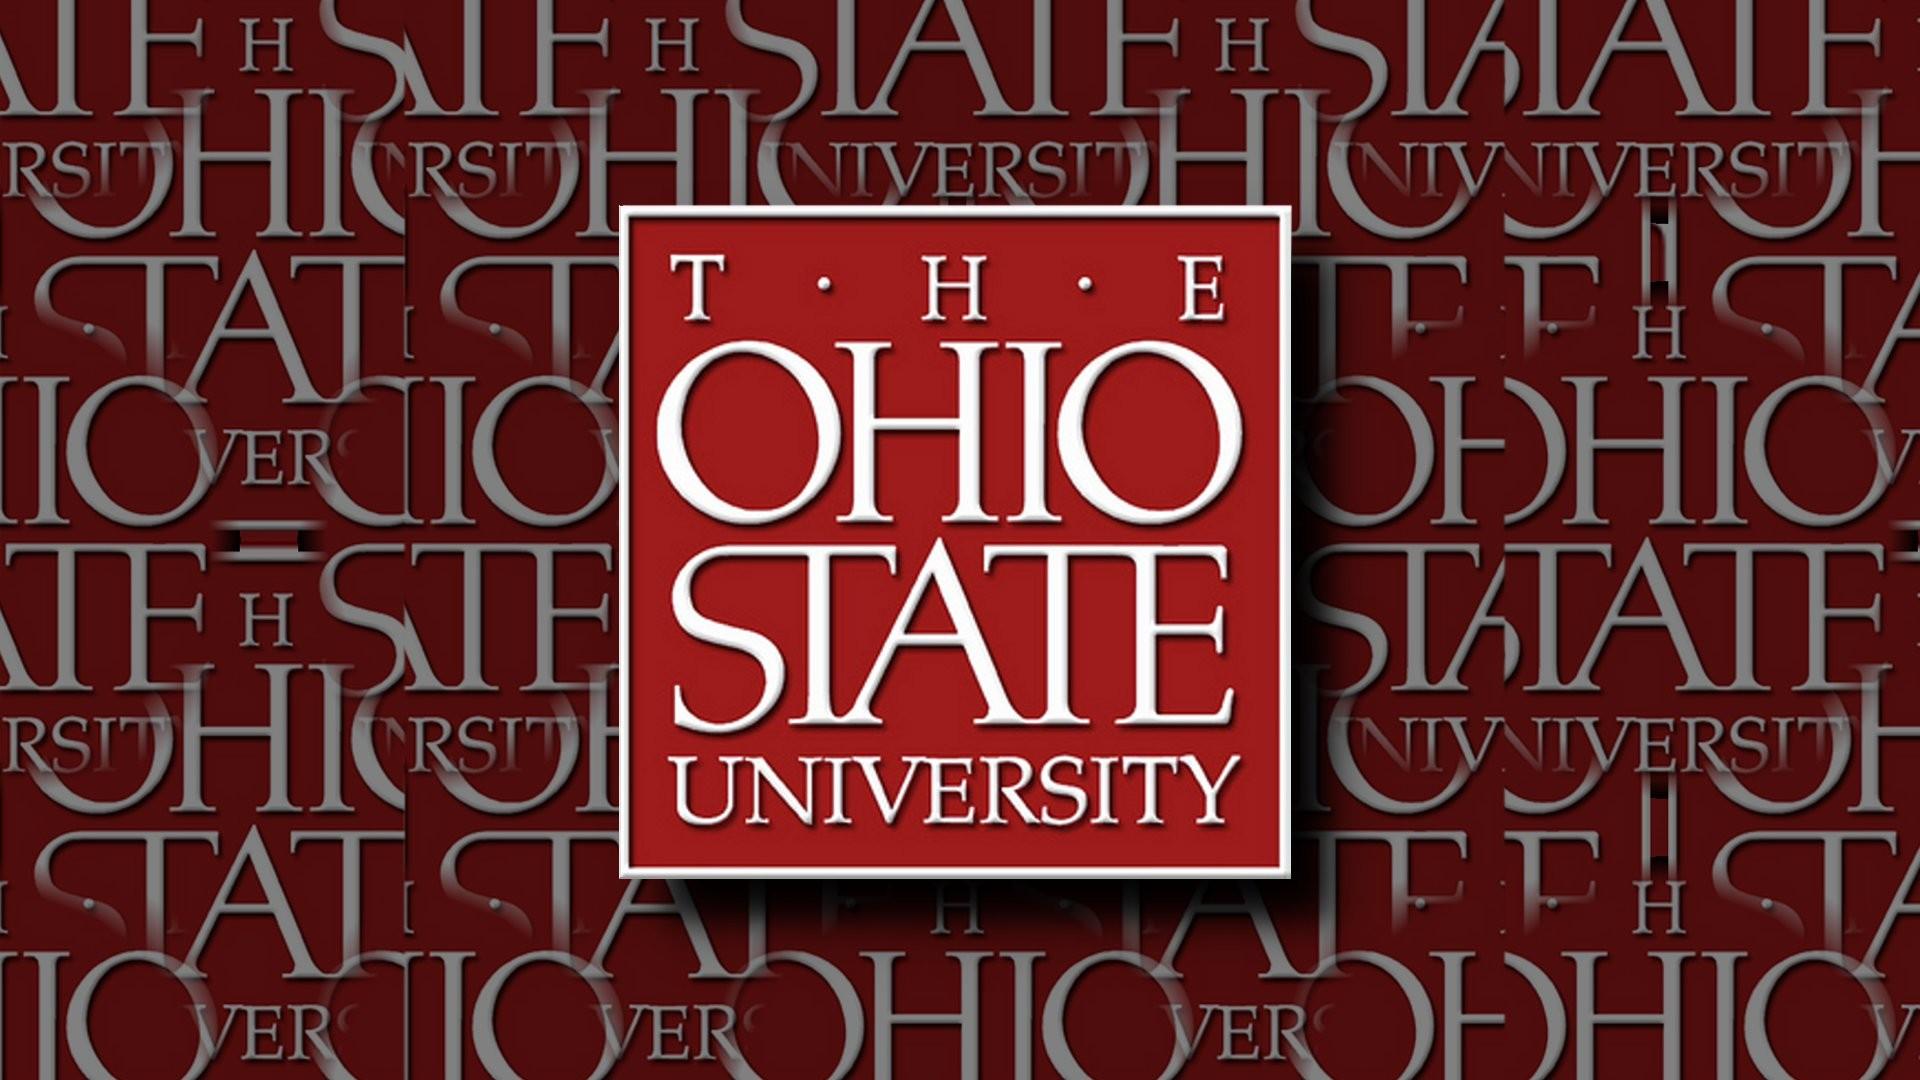 OSU Wallpaper 39 – Ohio State Football Wallpaper (30523115) – Fanpop